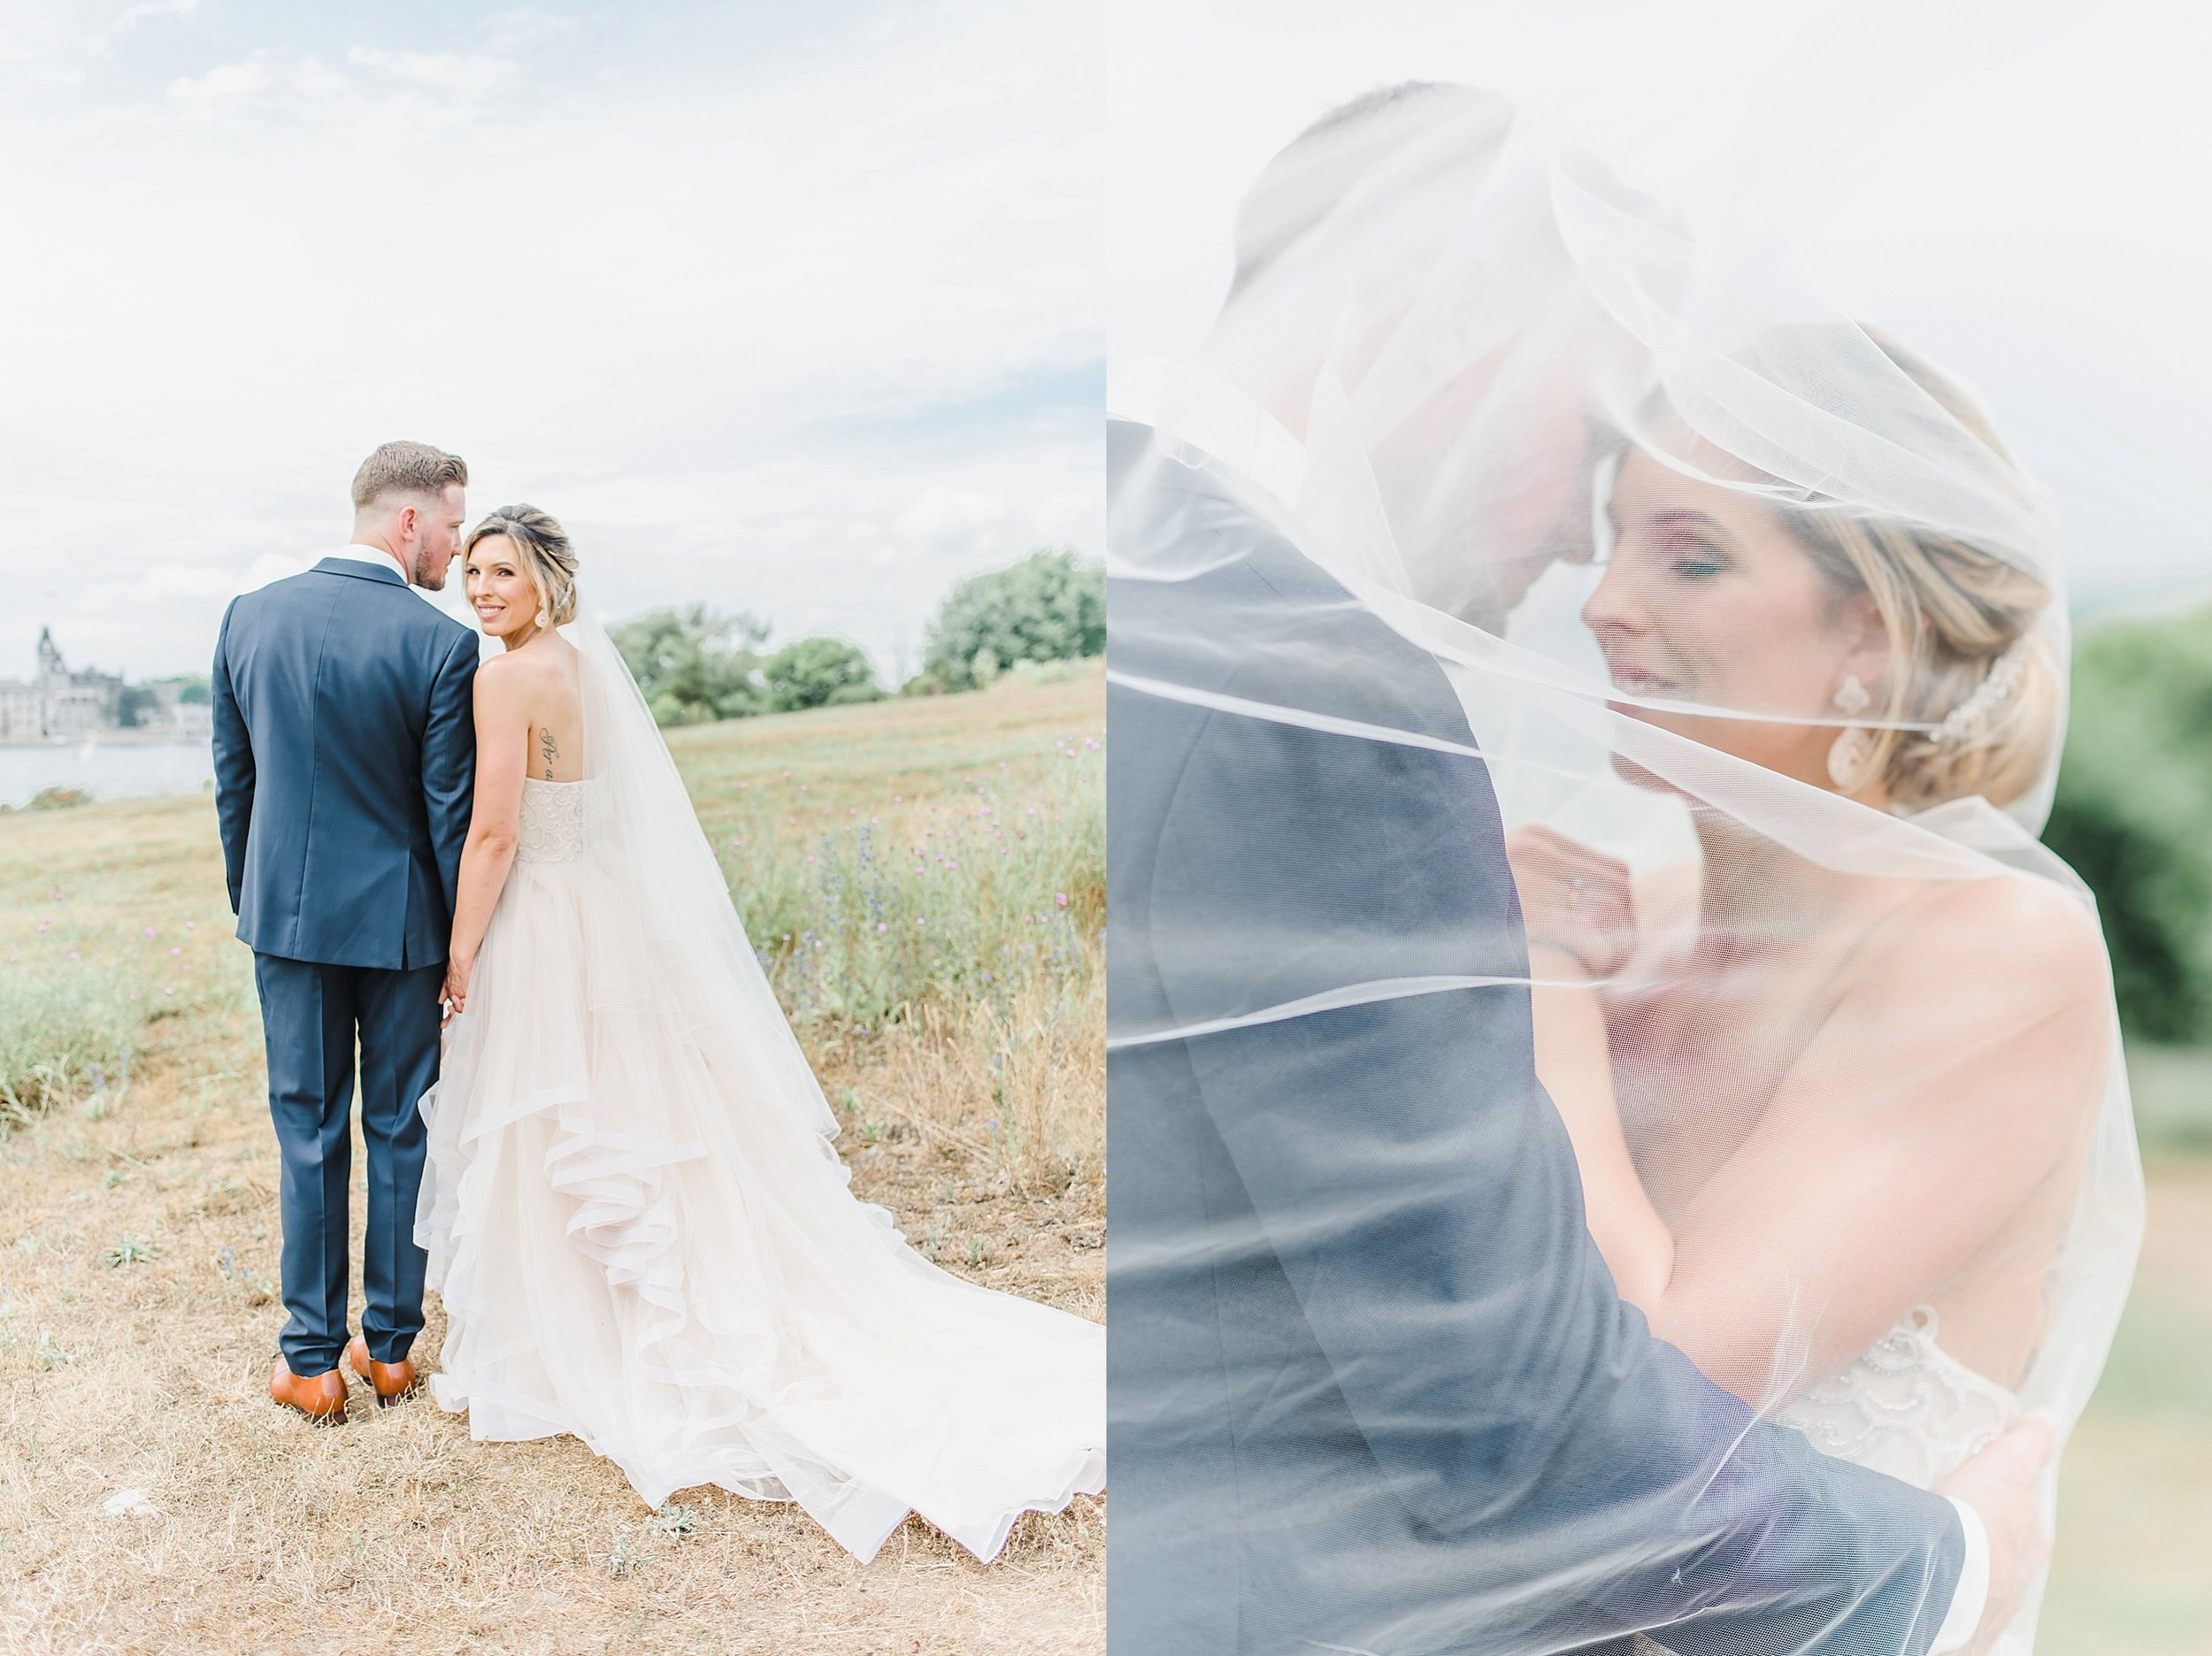 light airy indie fine art ottawa wedding photographer | Ali and Batoul Photography_0168.jpg